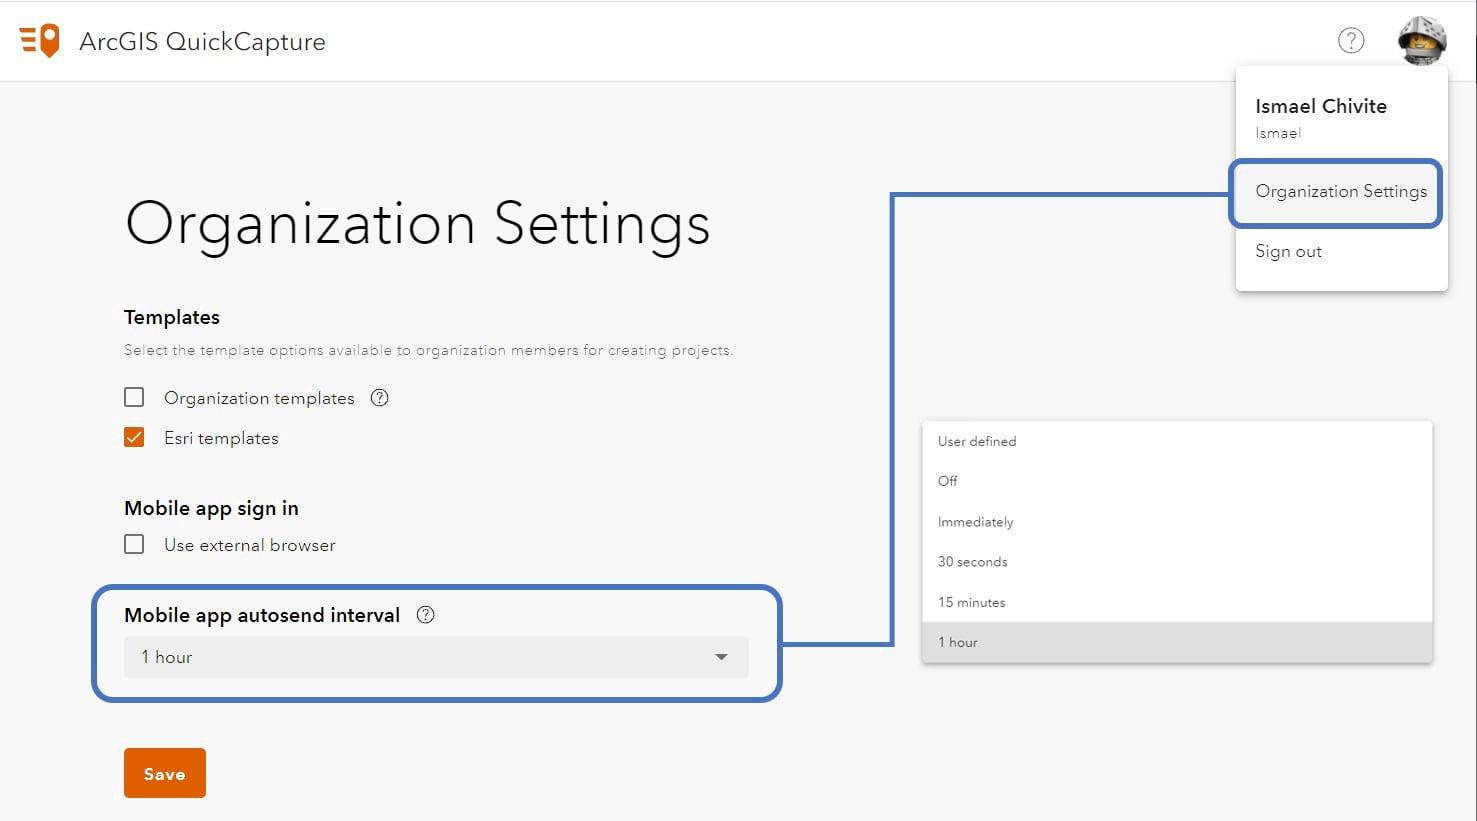 QuickCapture organizational settings dialgo shown